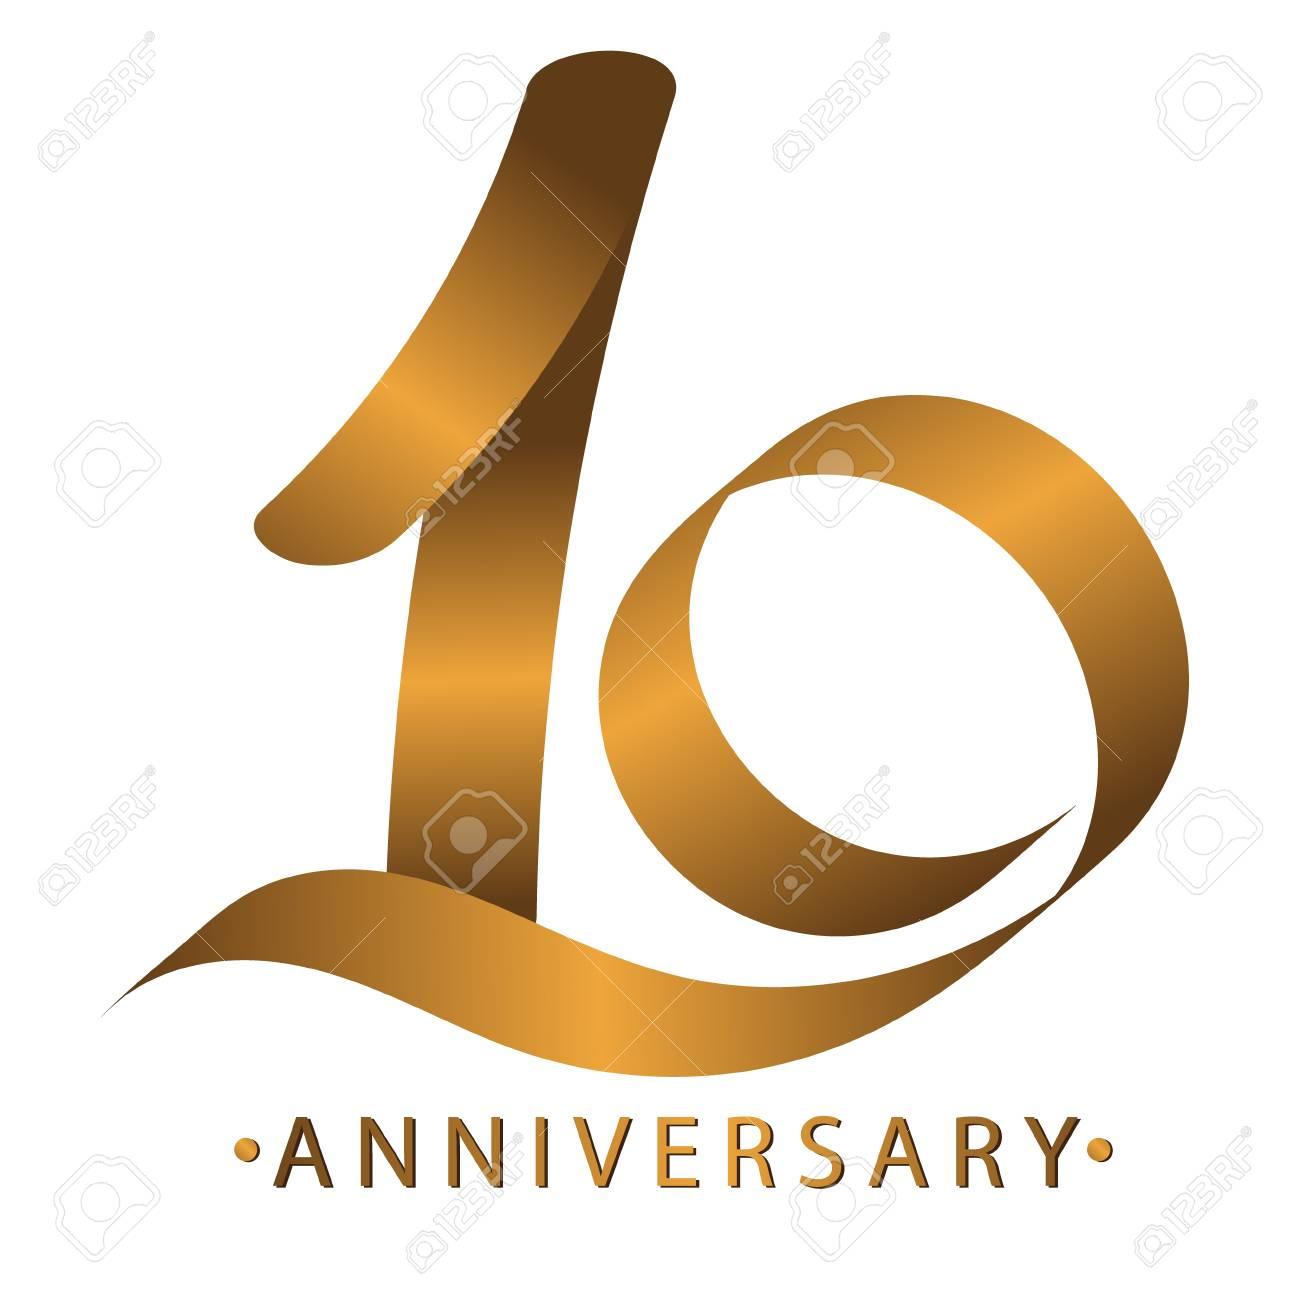 Handwriting Celebrating Anniversary Of Number 10 Th Year